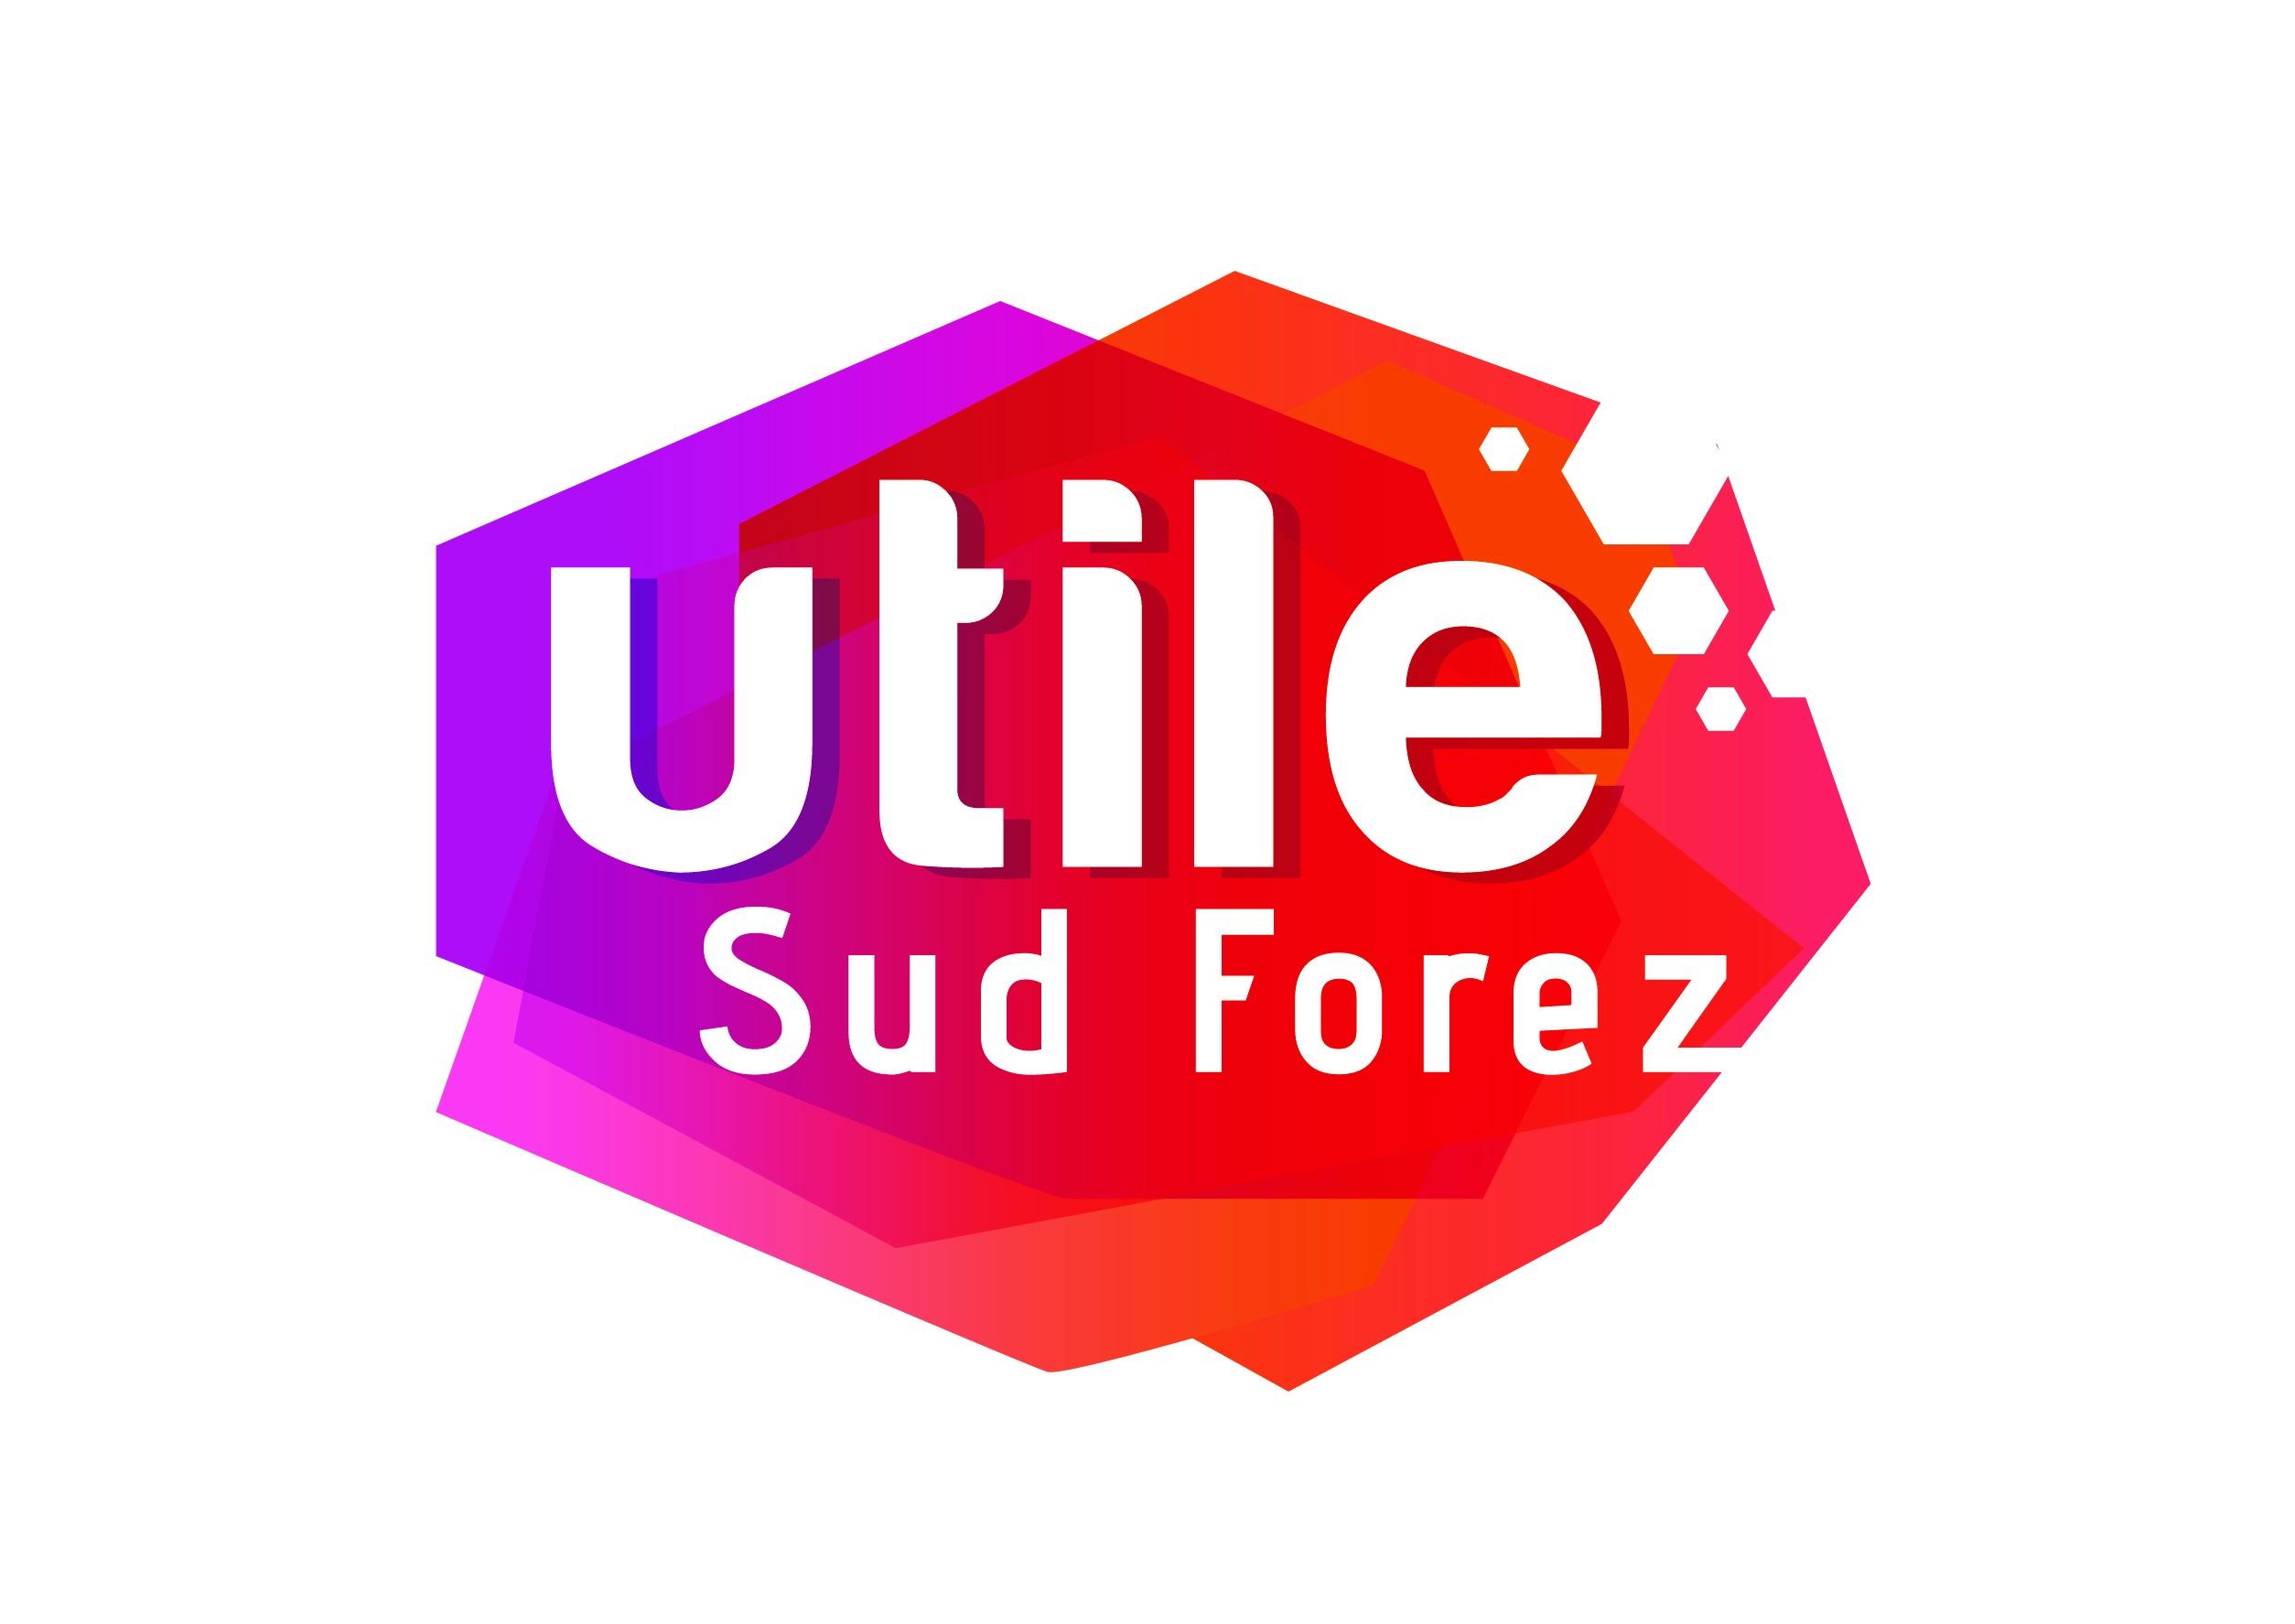 UTILE INTERIM - ETTI SUD FOREZ